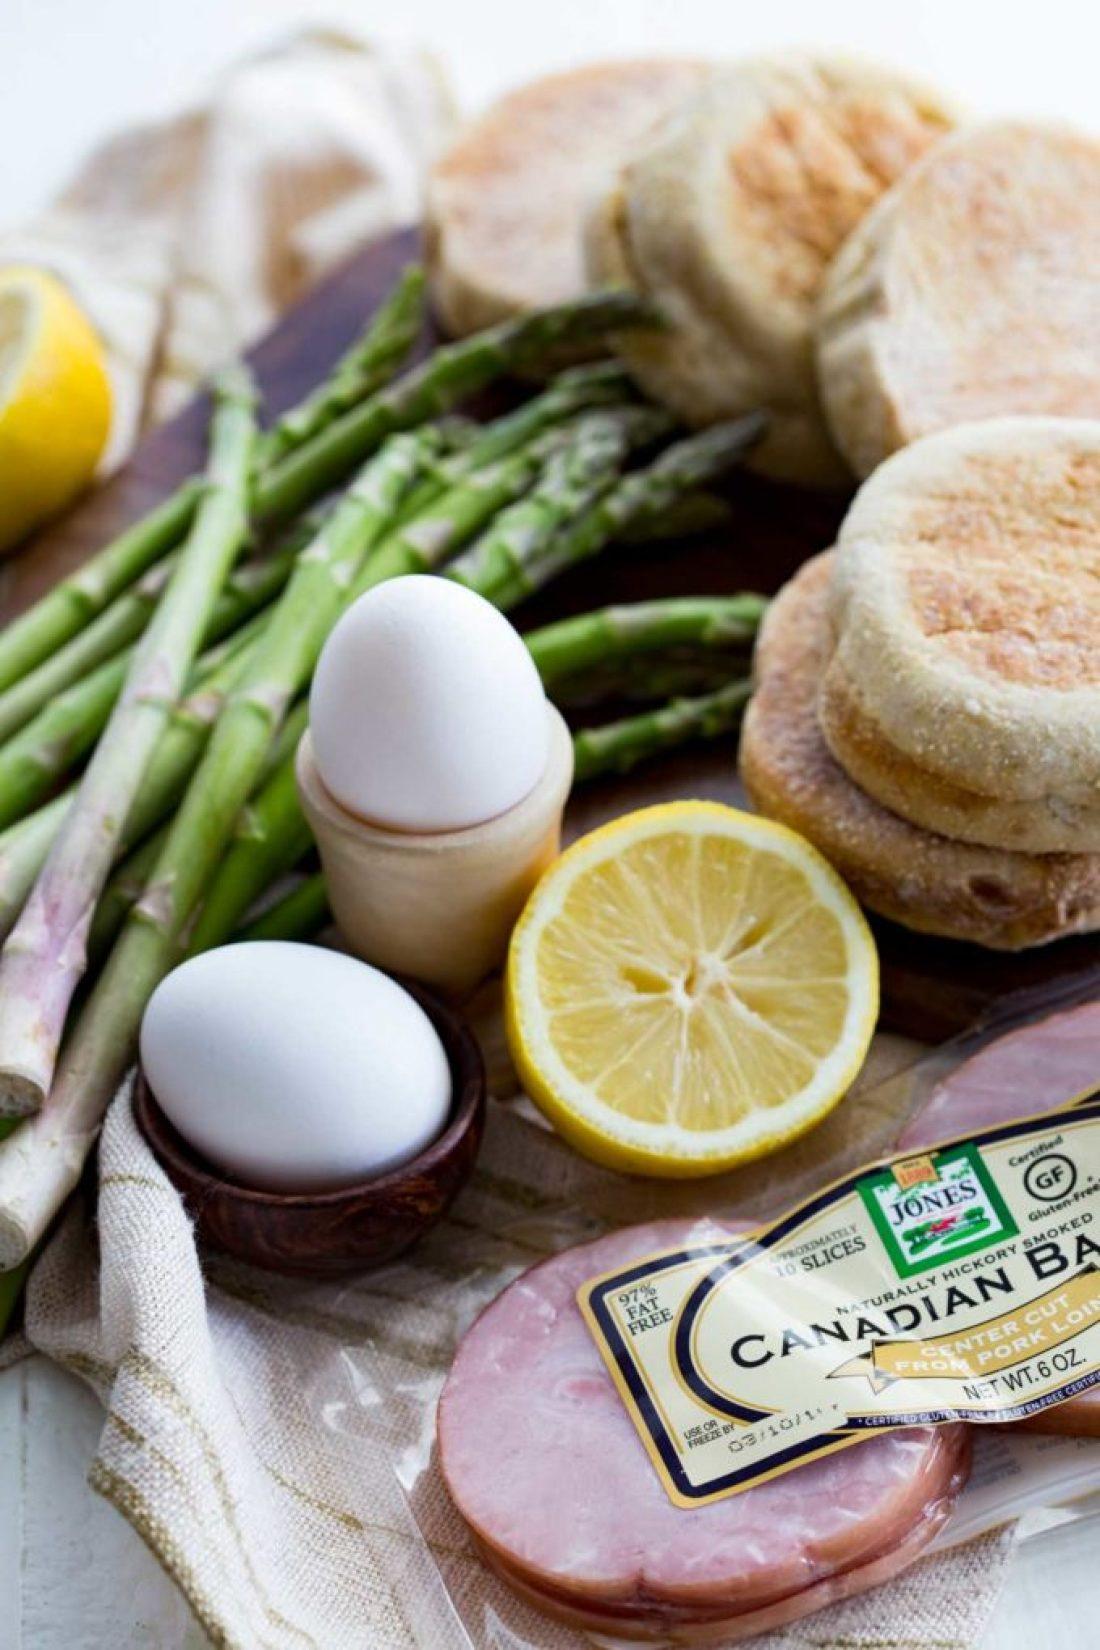 Ingredients for eggs benedict, a hearty breakfast, fresh ingredients